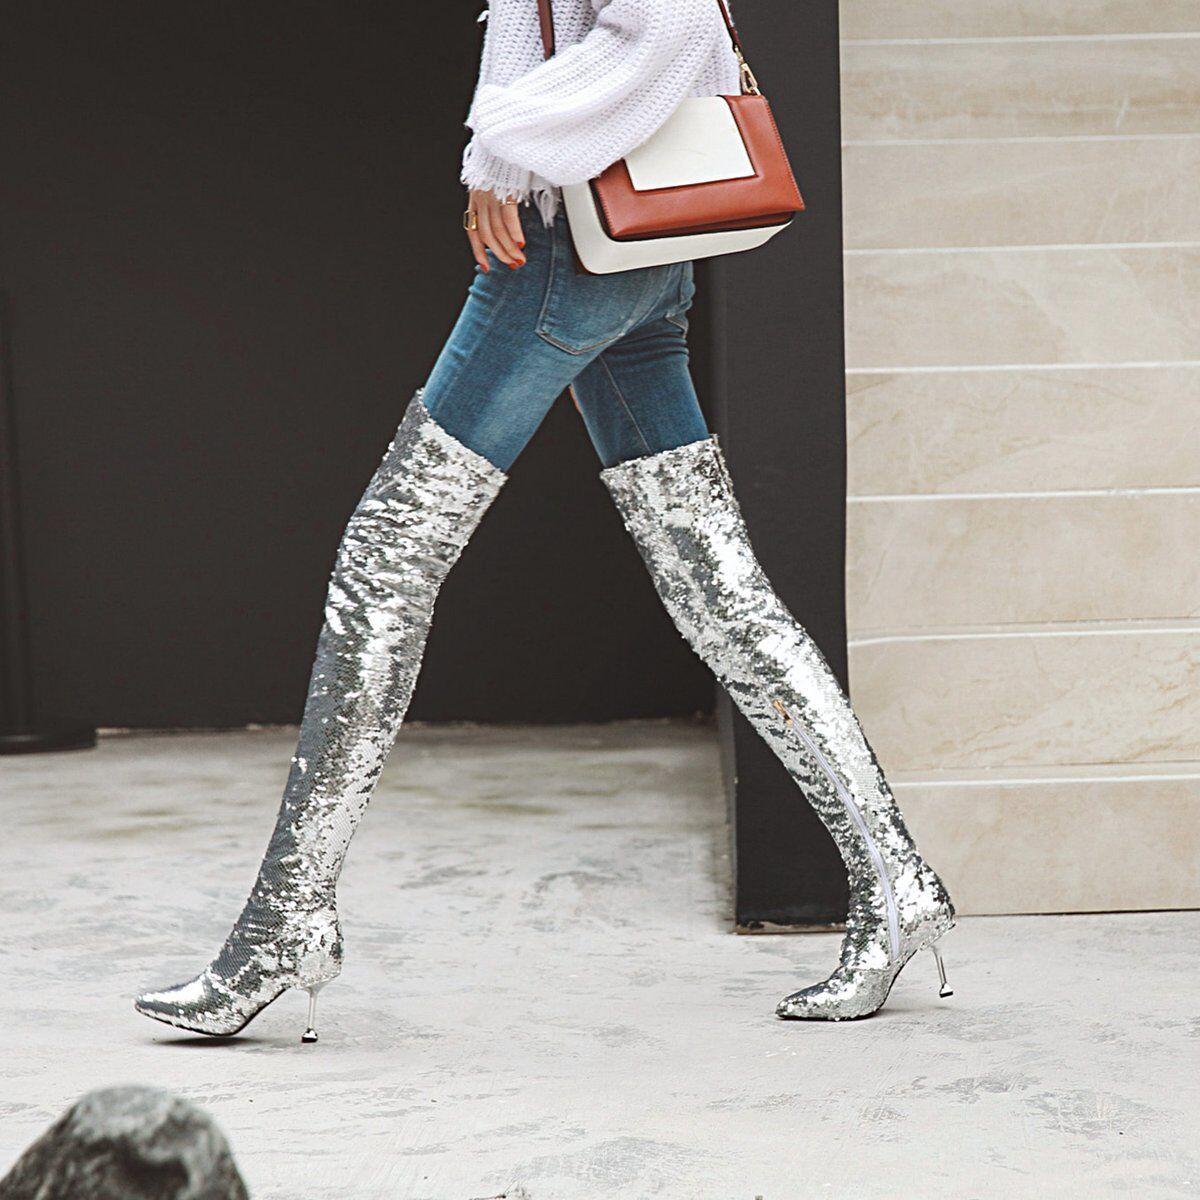 New mujer Fashion Glitter Bling Zip High Heels Nightclub Over Knee botas zapatos